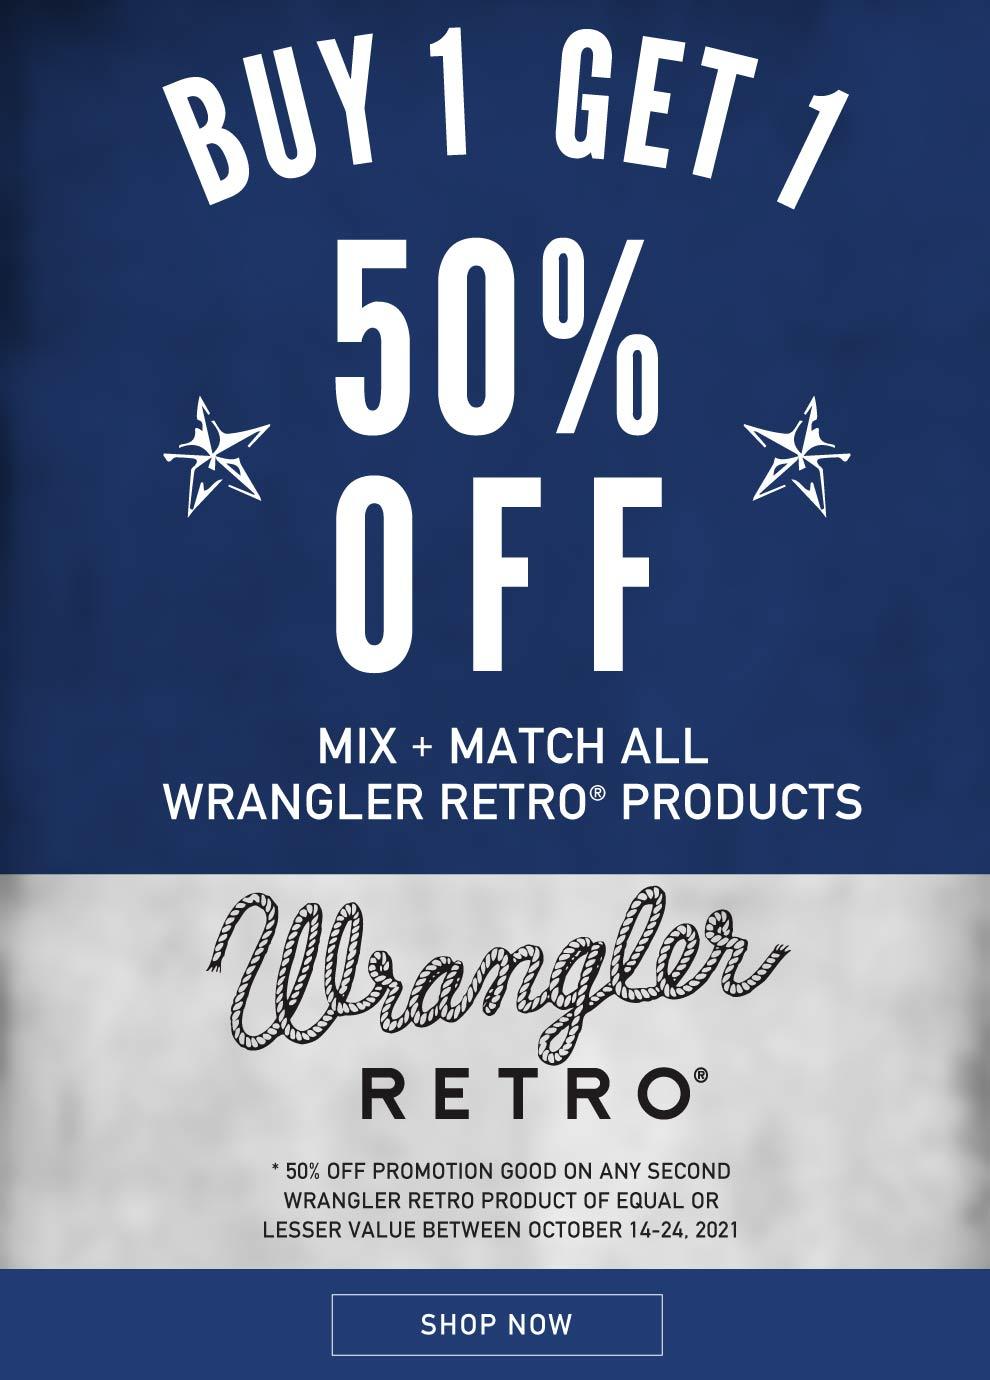 Wrangler Retro Jeans Buy One Get One Half Off